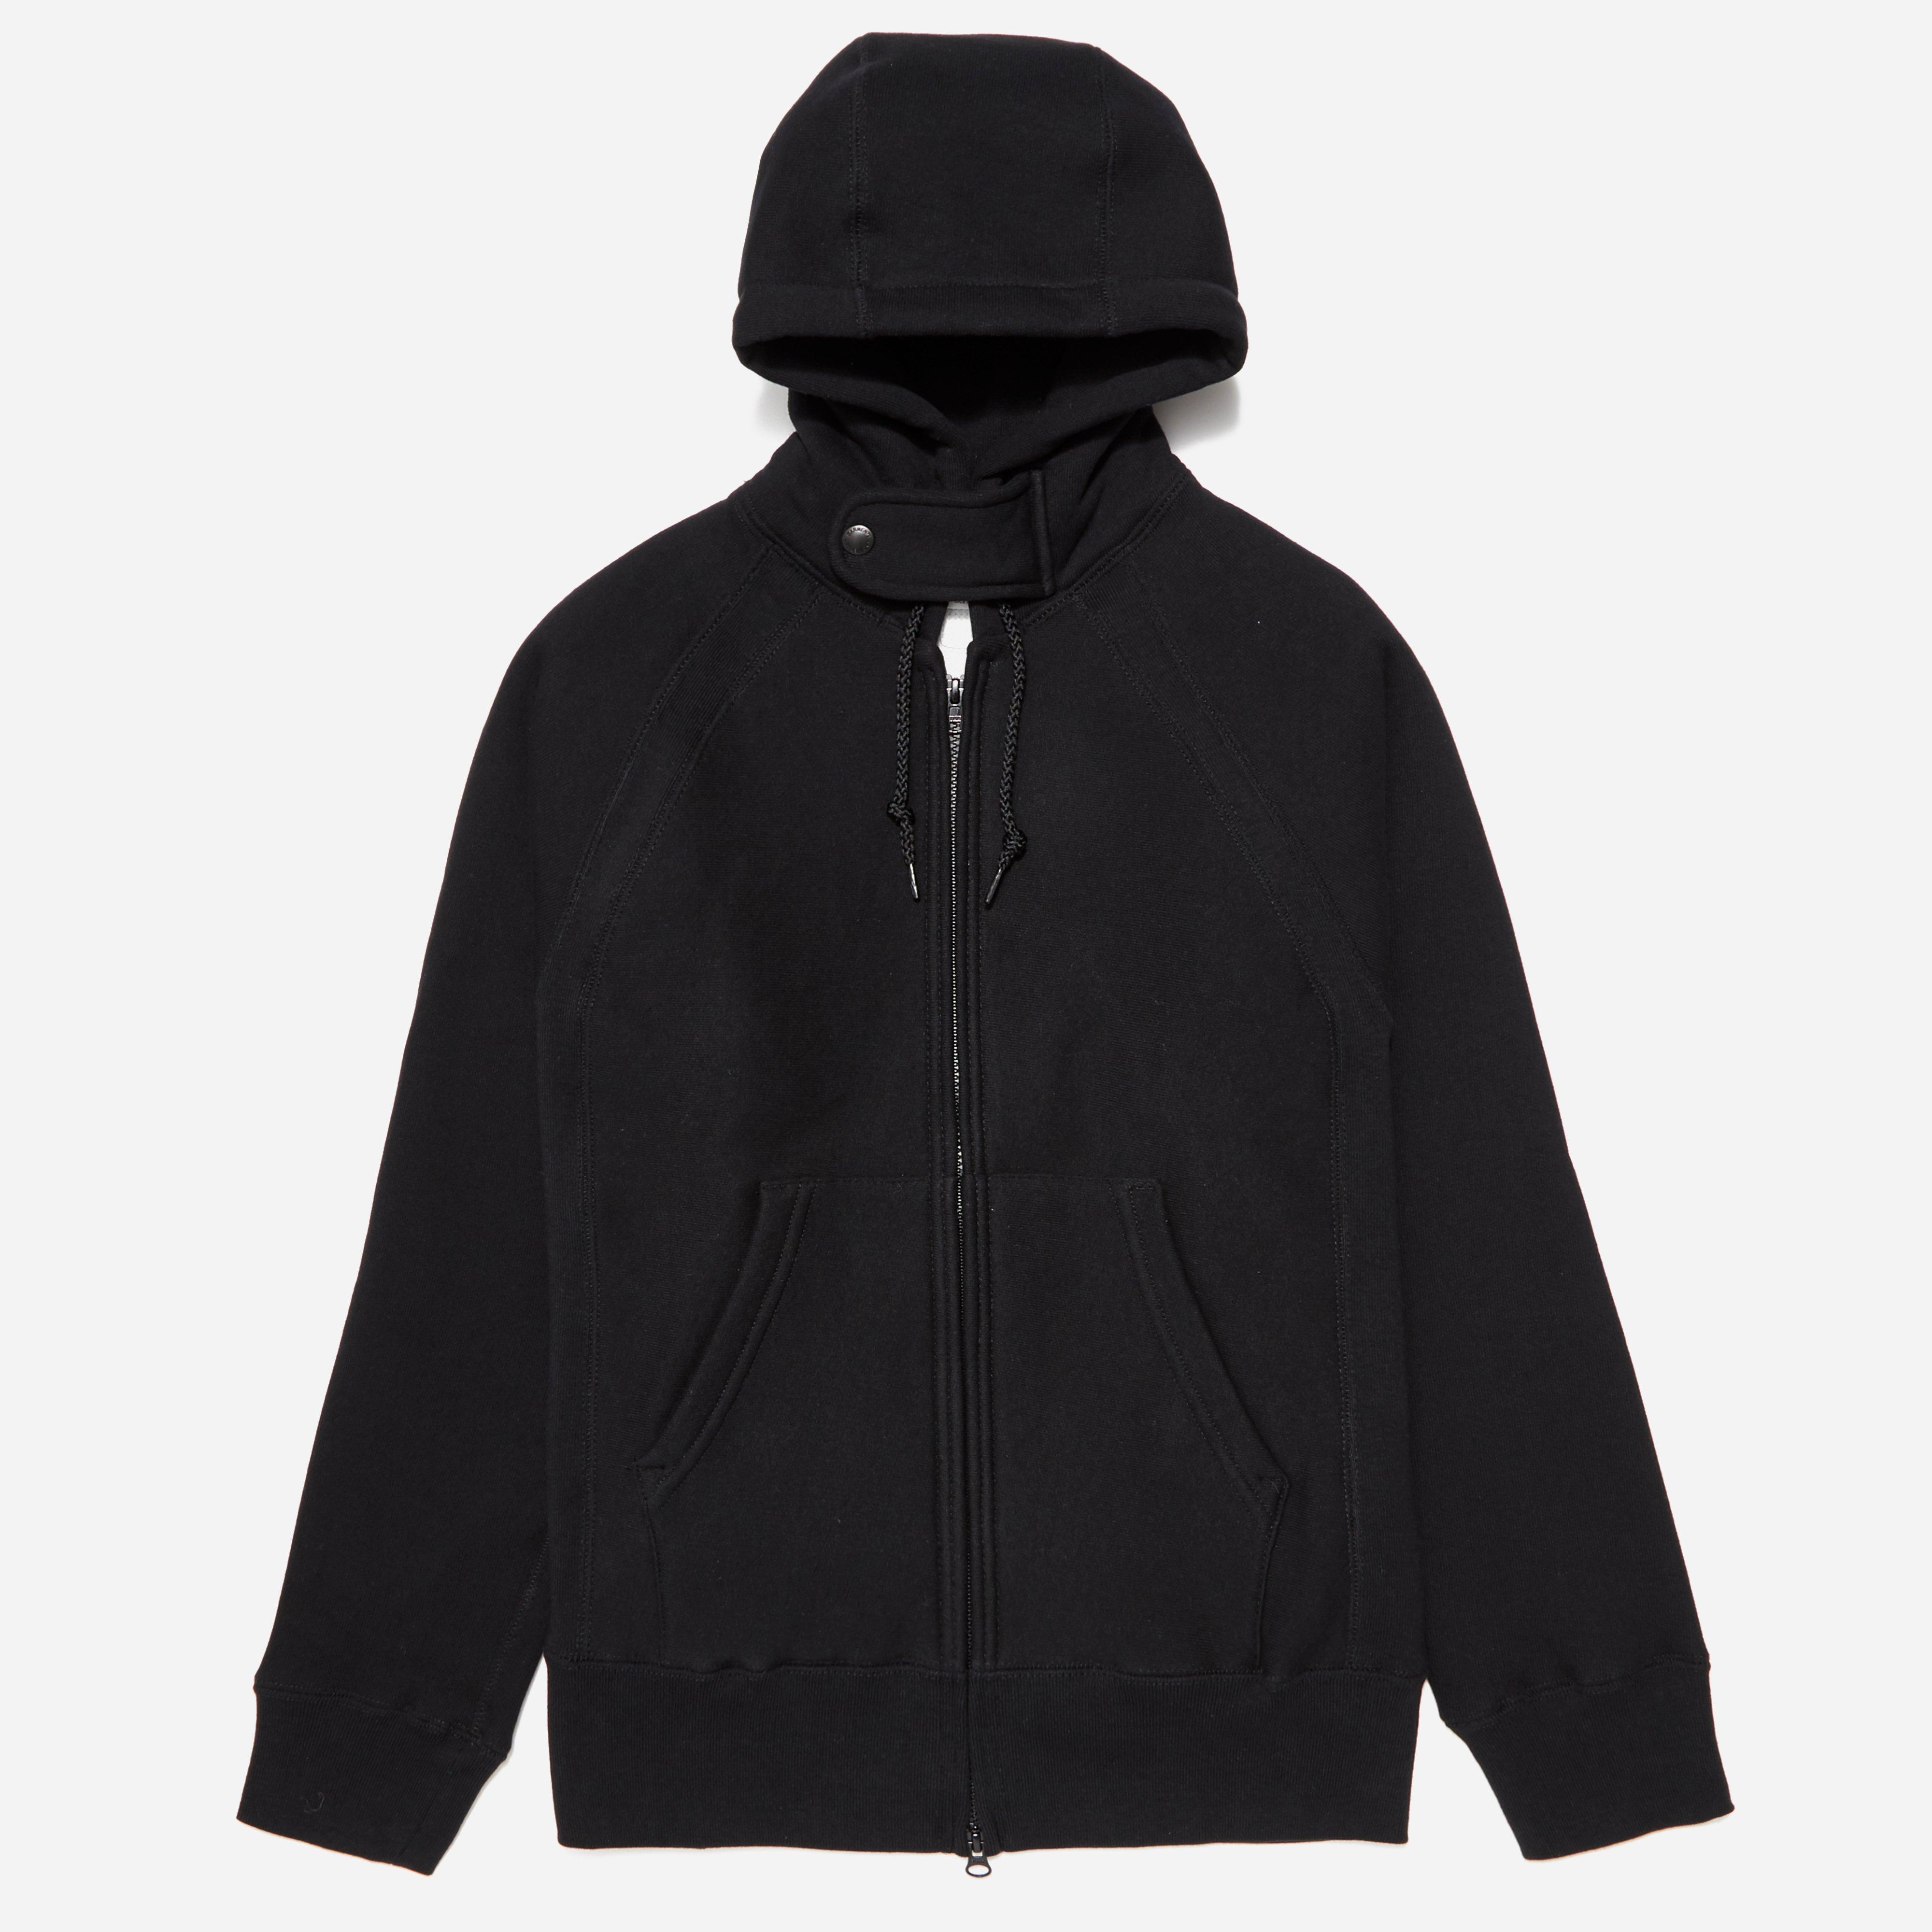 Engineered Garments Workaday Fleece Raglan Zip Hoodie